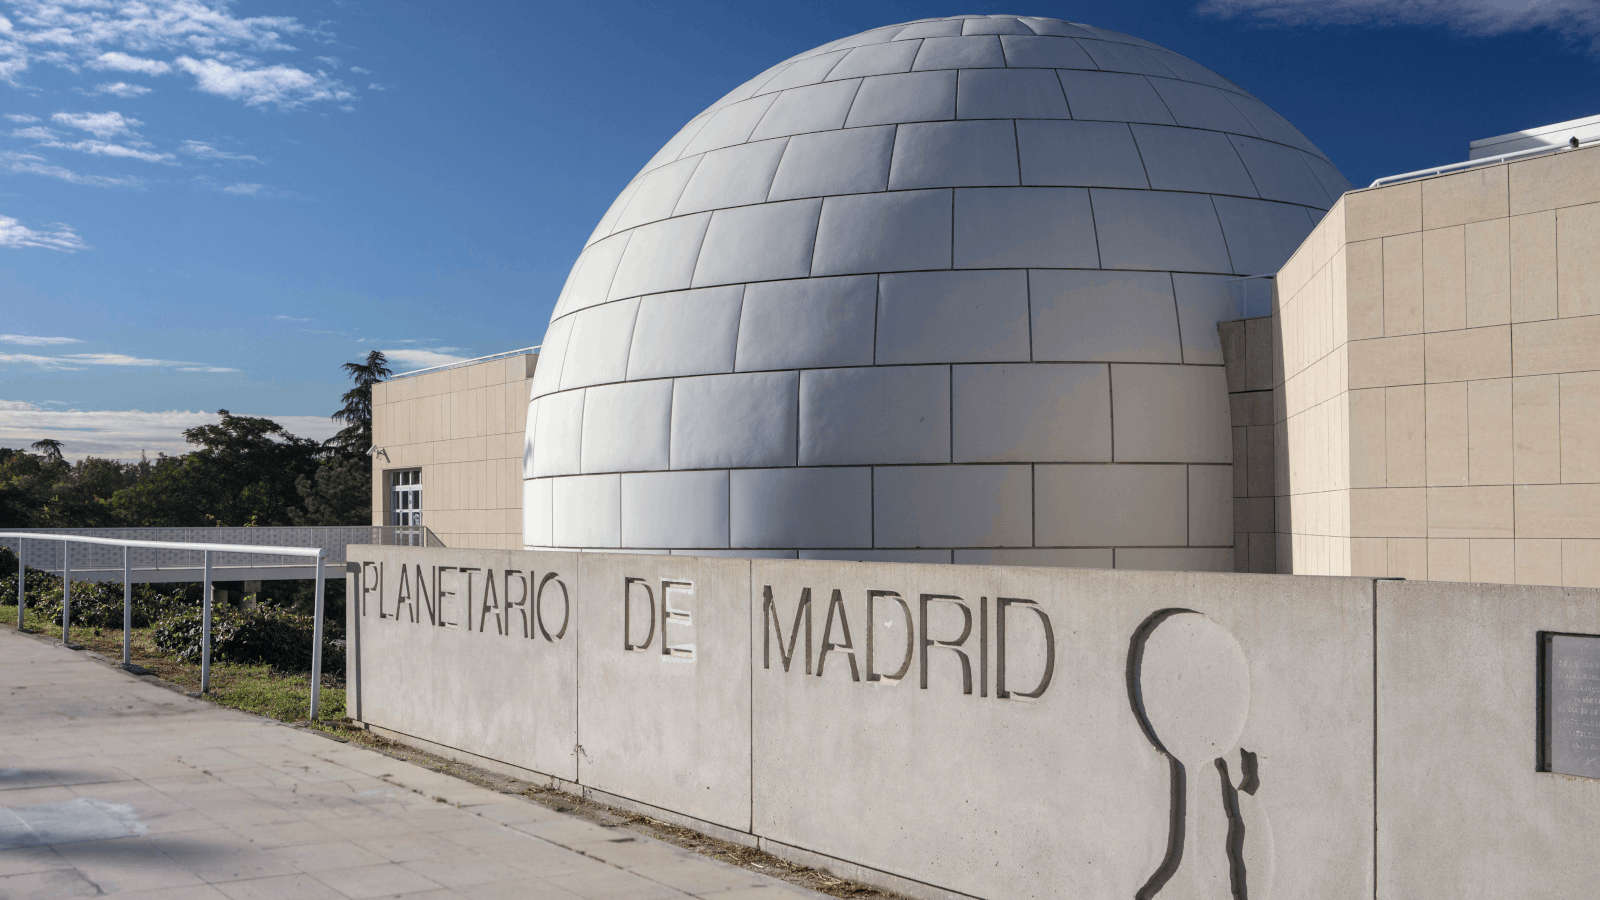 C3 Planetario de Madrid